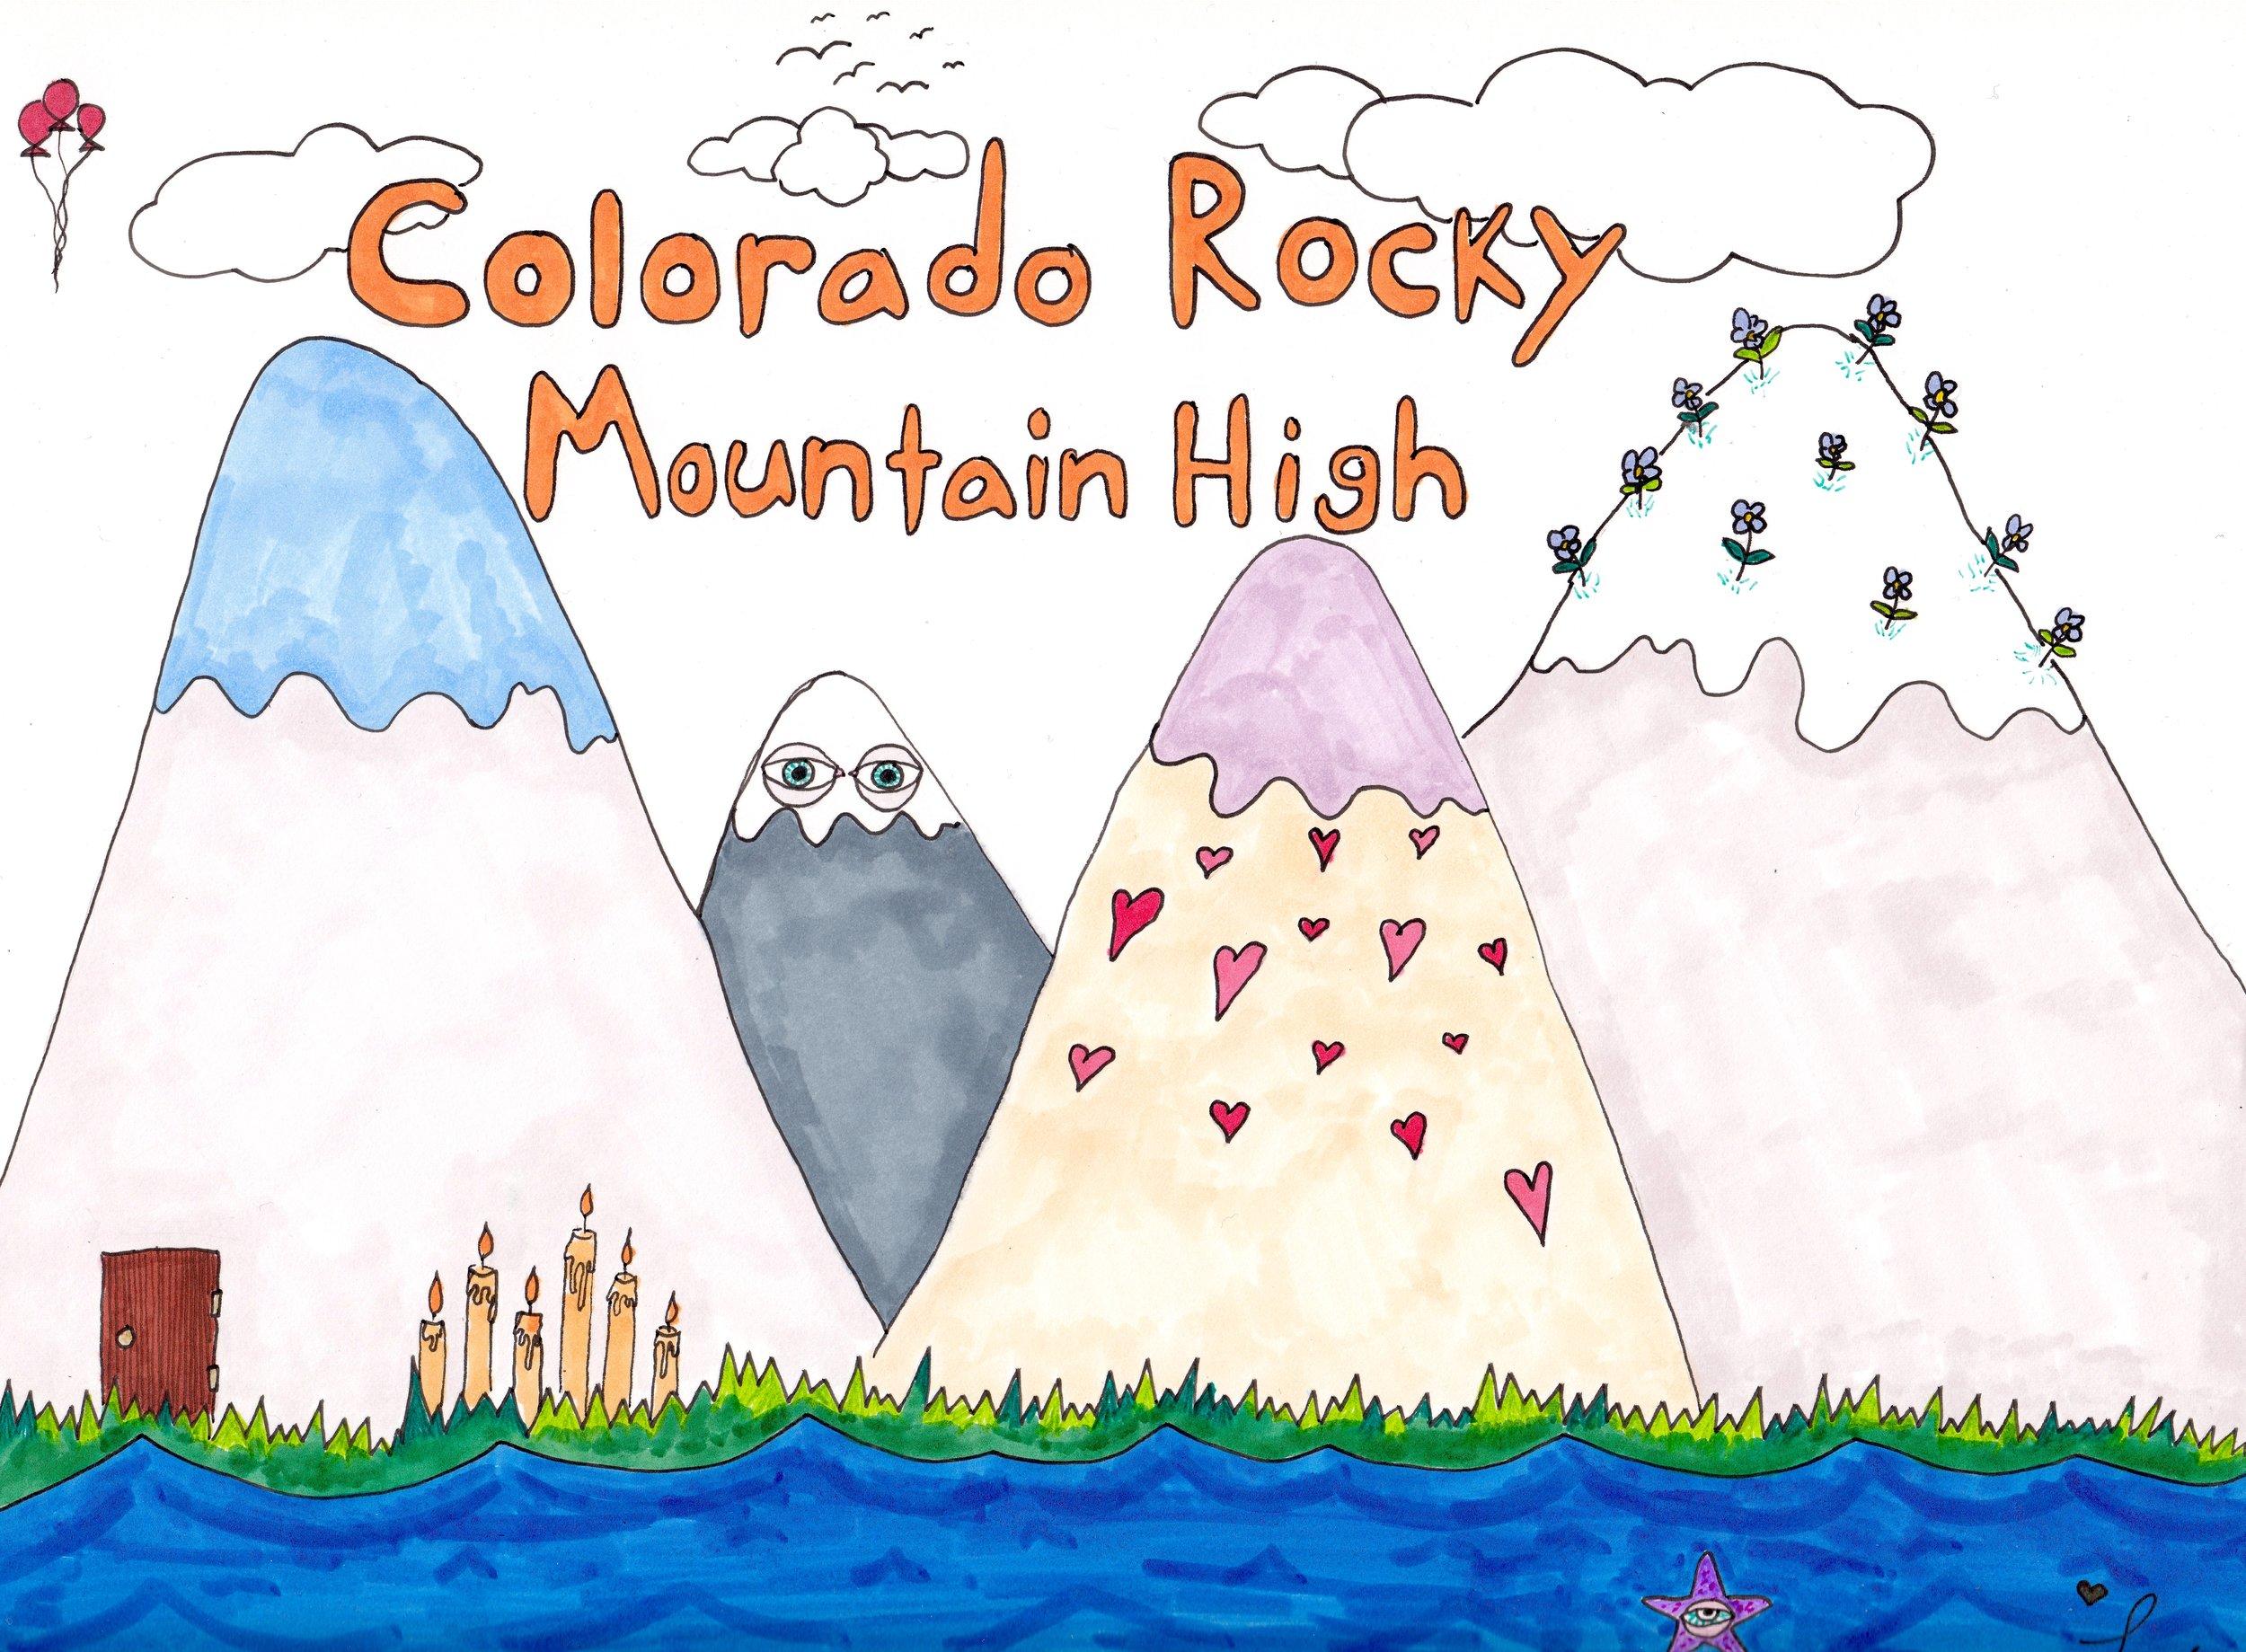 Colorado rock mountain crop .jpg